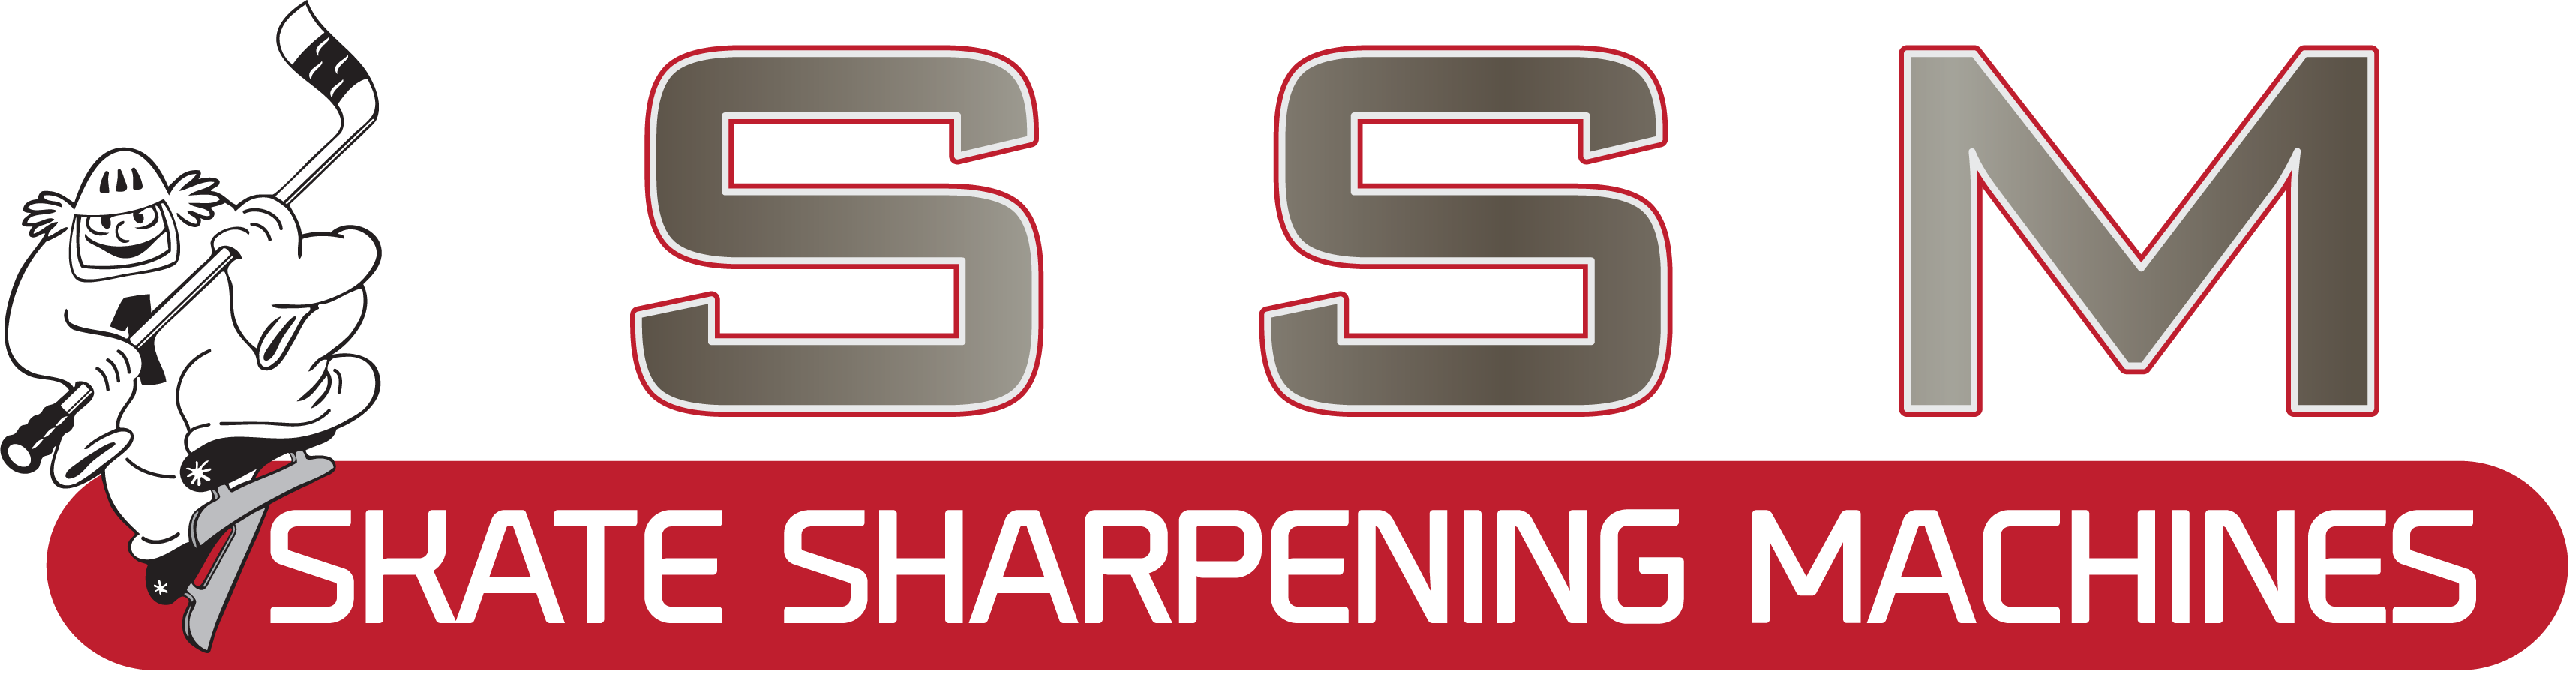 SSM Official logo